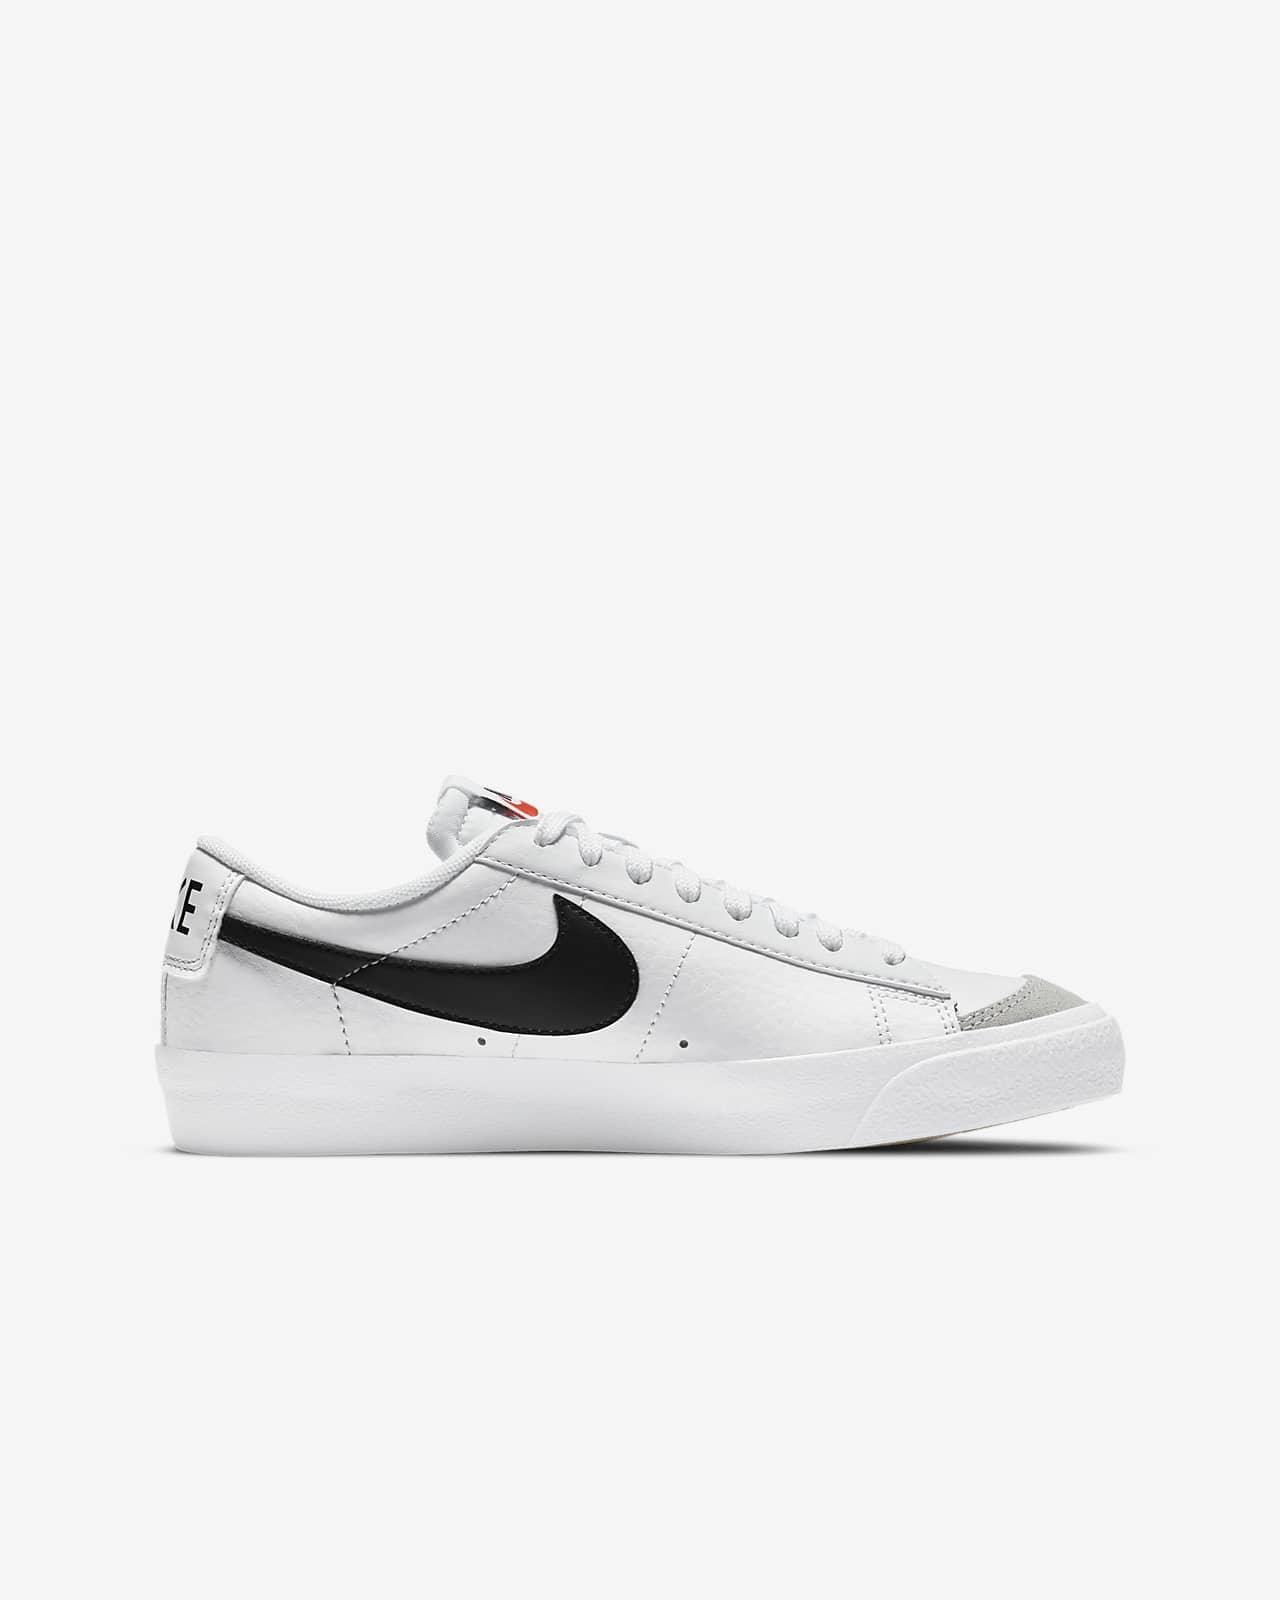 Chaussure Nike Blazer Low '77 pour Enfant plus âgé. Nike LU